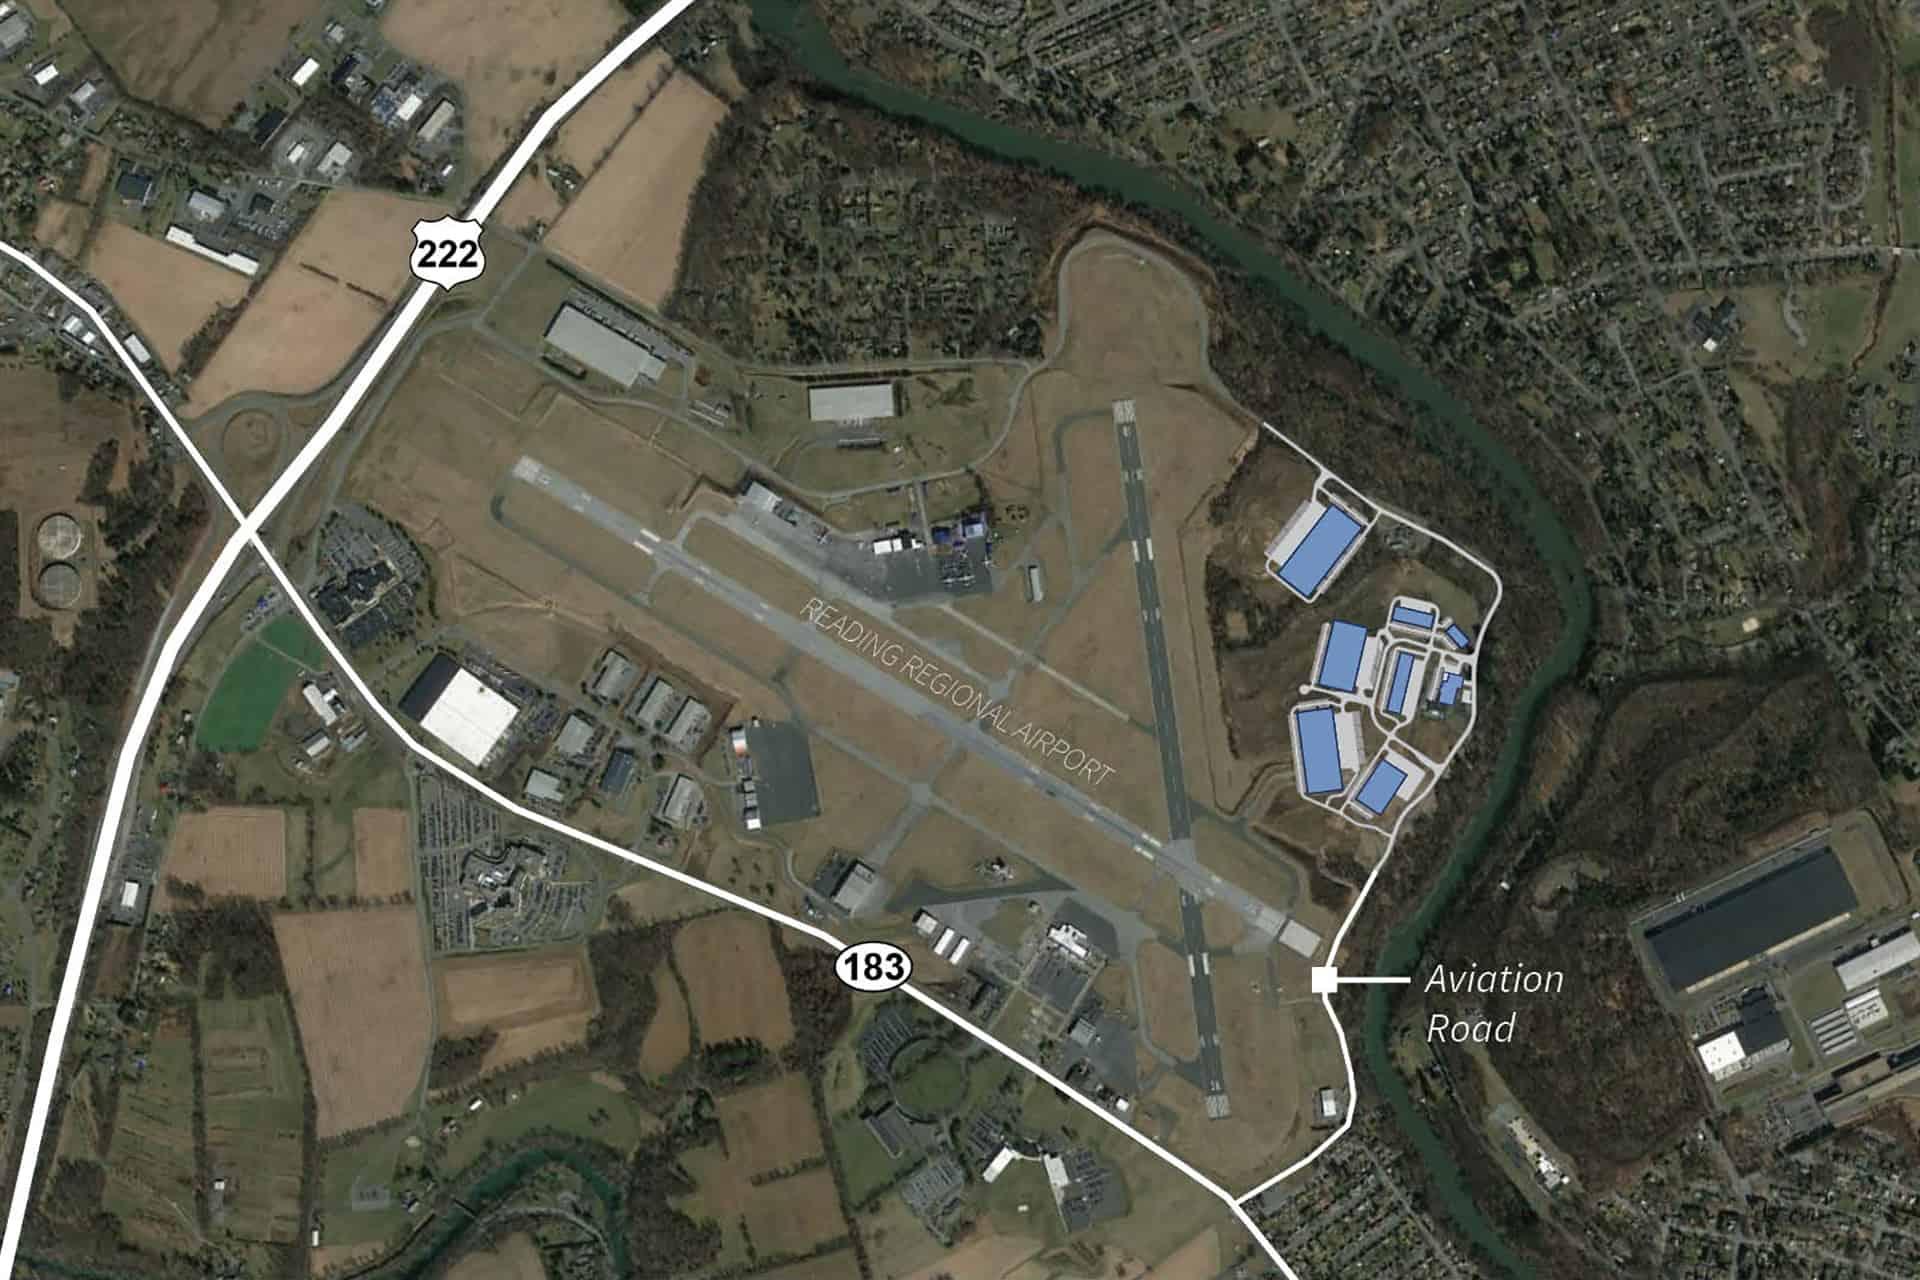 Berks Park 183 - Site To 222 Aerial